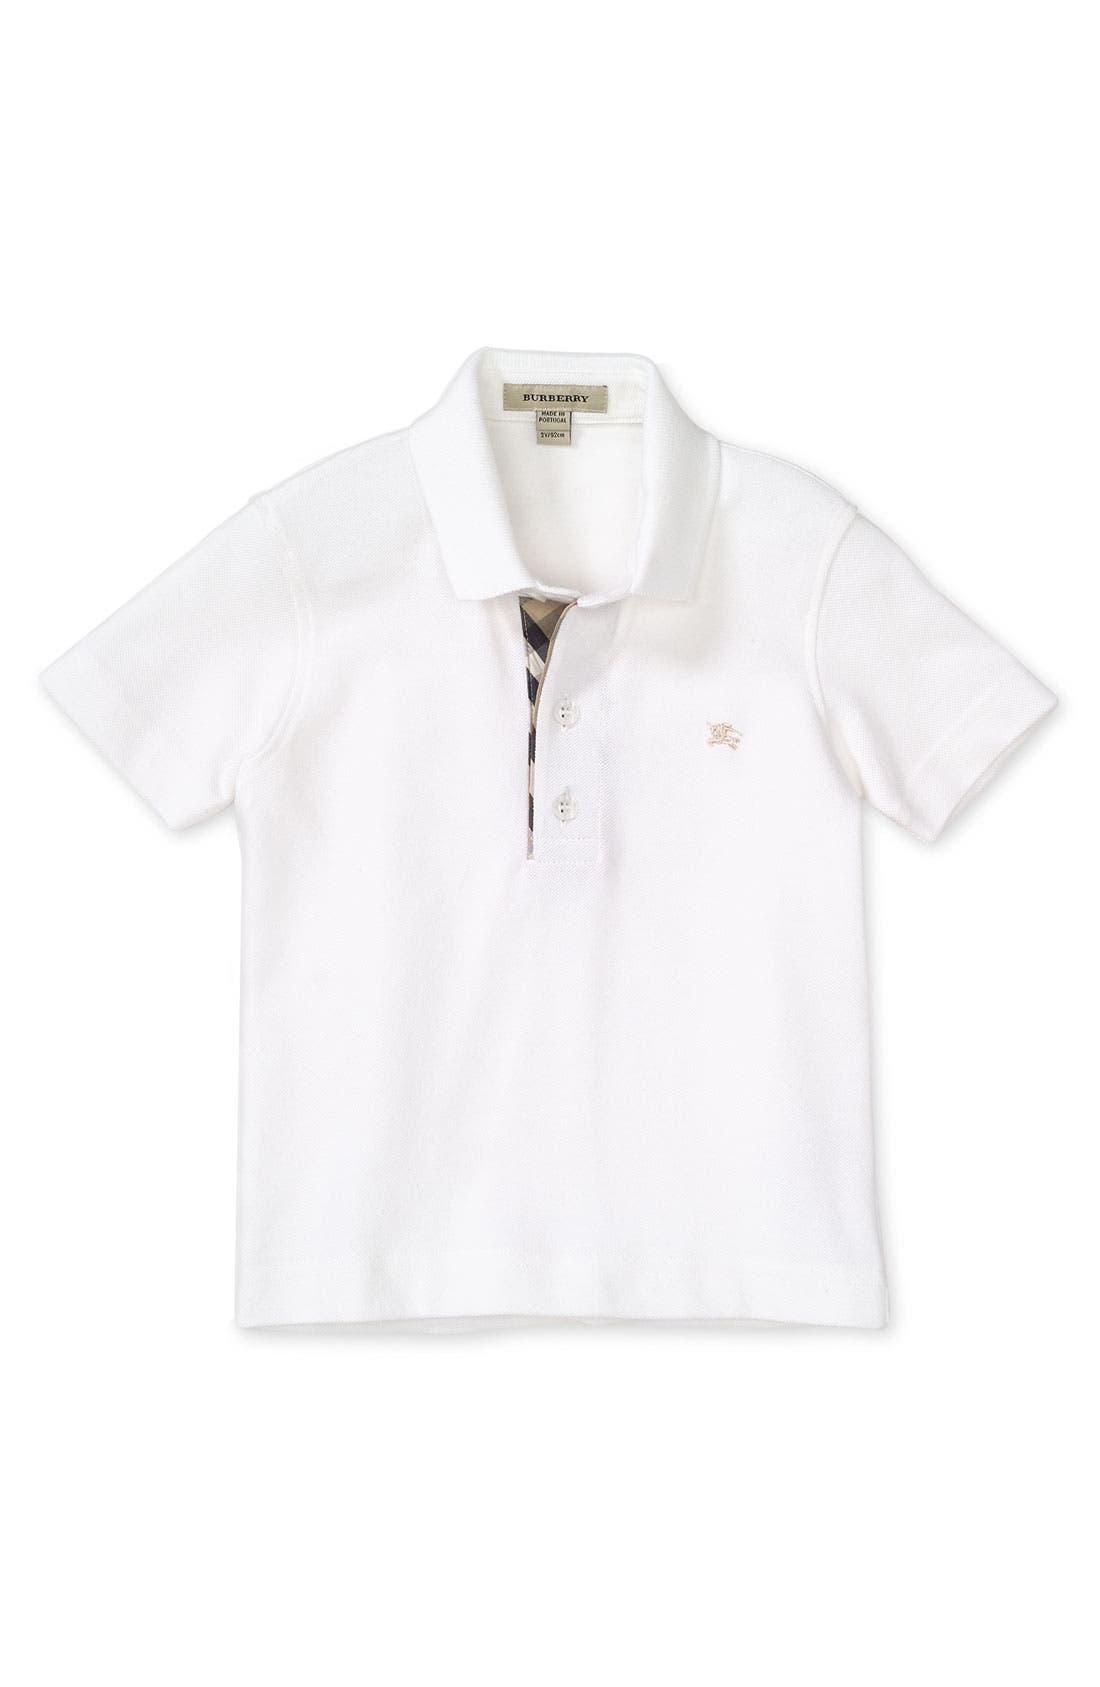 Alternate Image 1 Selected - Burberry Short Sleeve Polo Shirt (Big Boys)